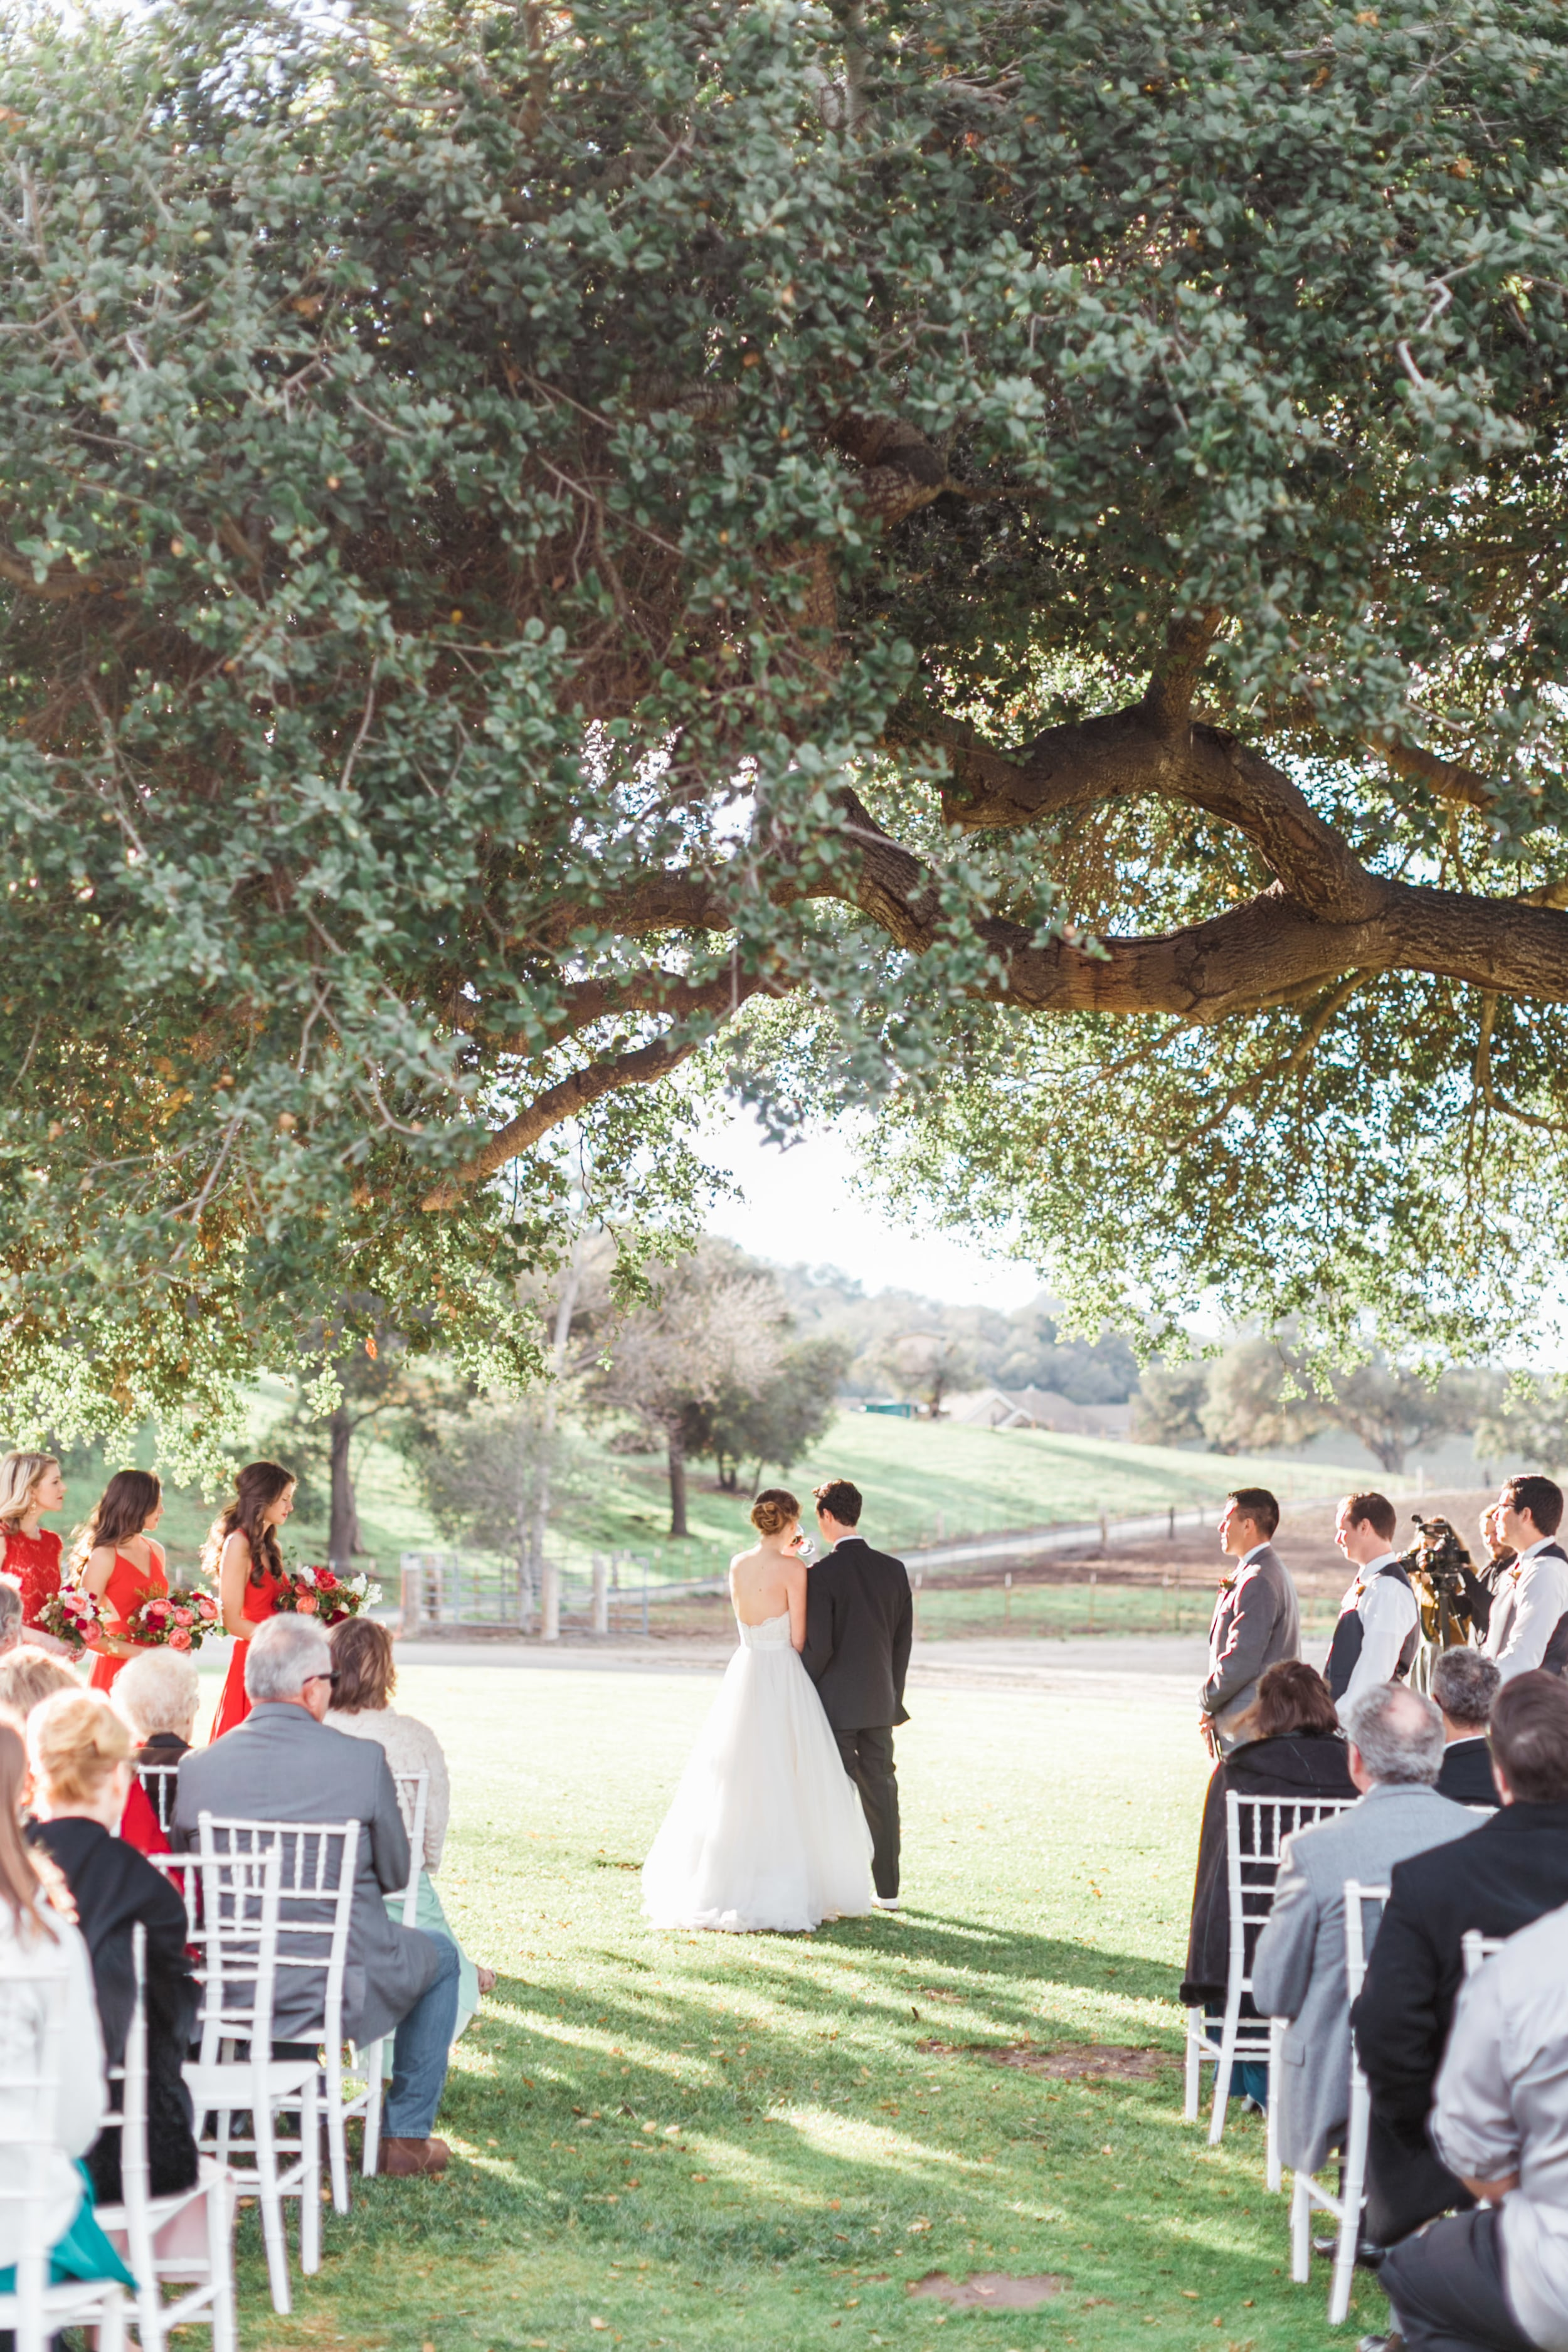 Natalie_Schutt_Photography_Winter_Wedding_San_Luis_Obispo-135.jpg